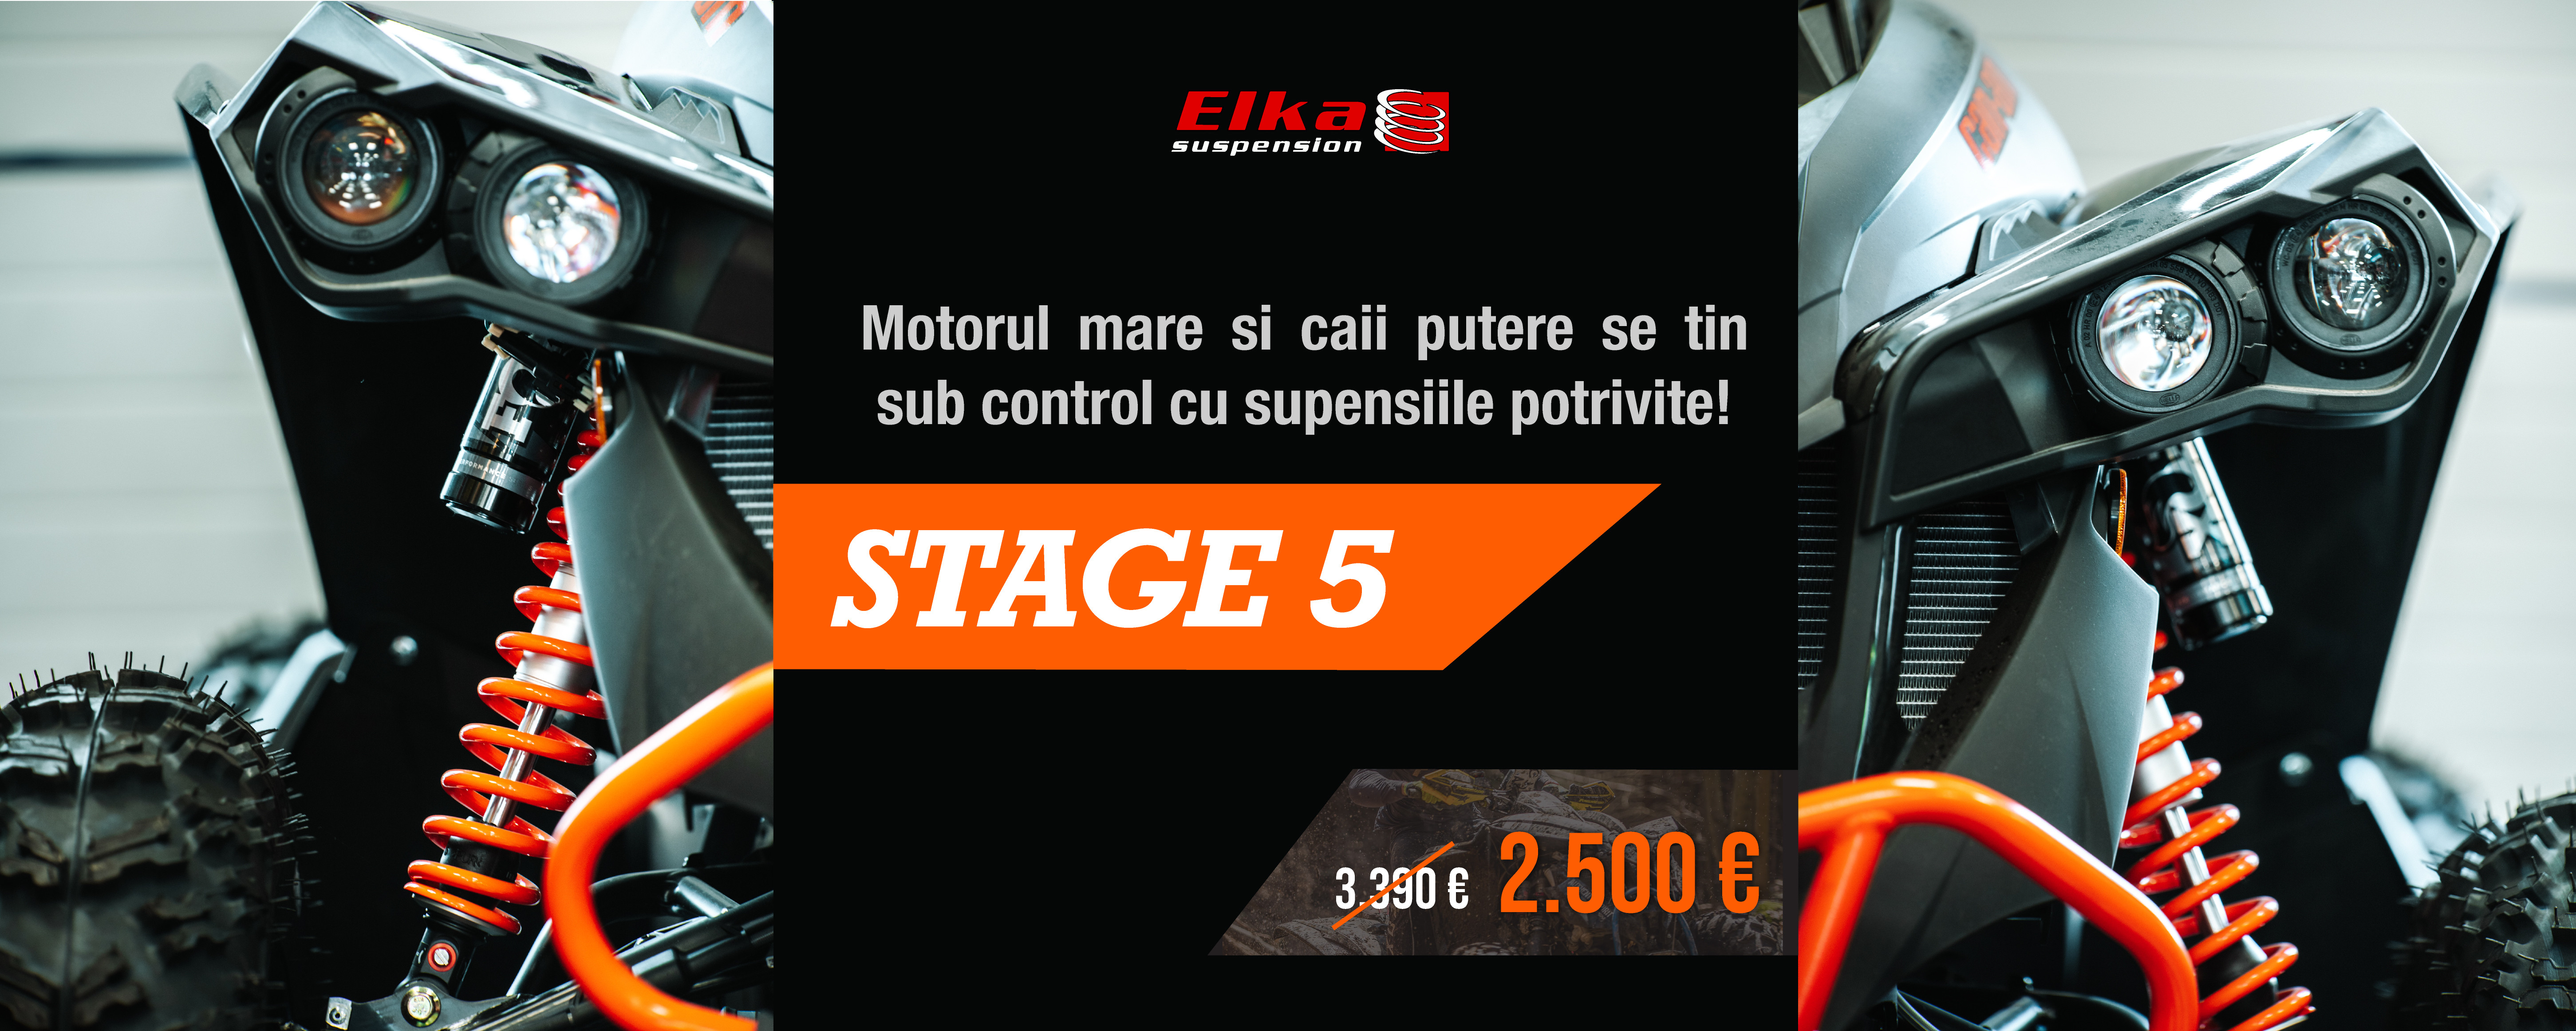 ELKA suspensions